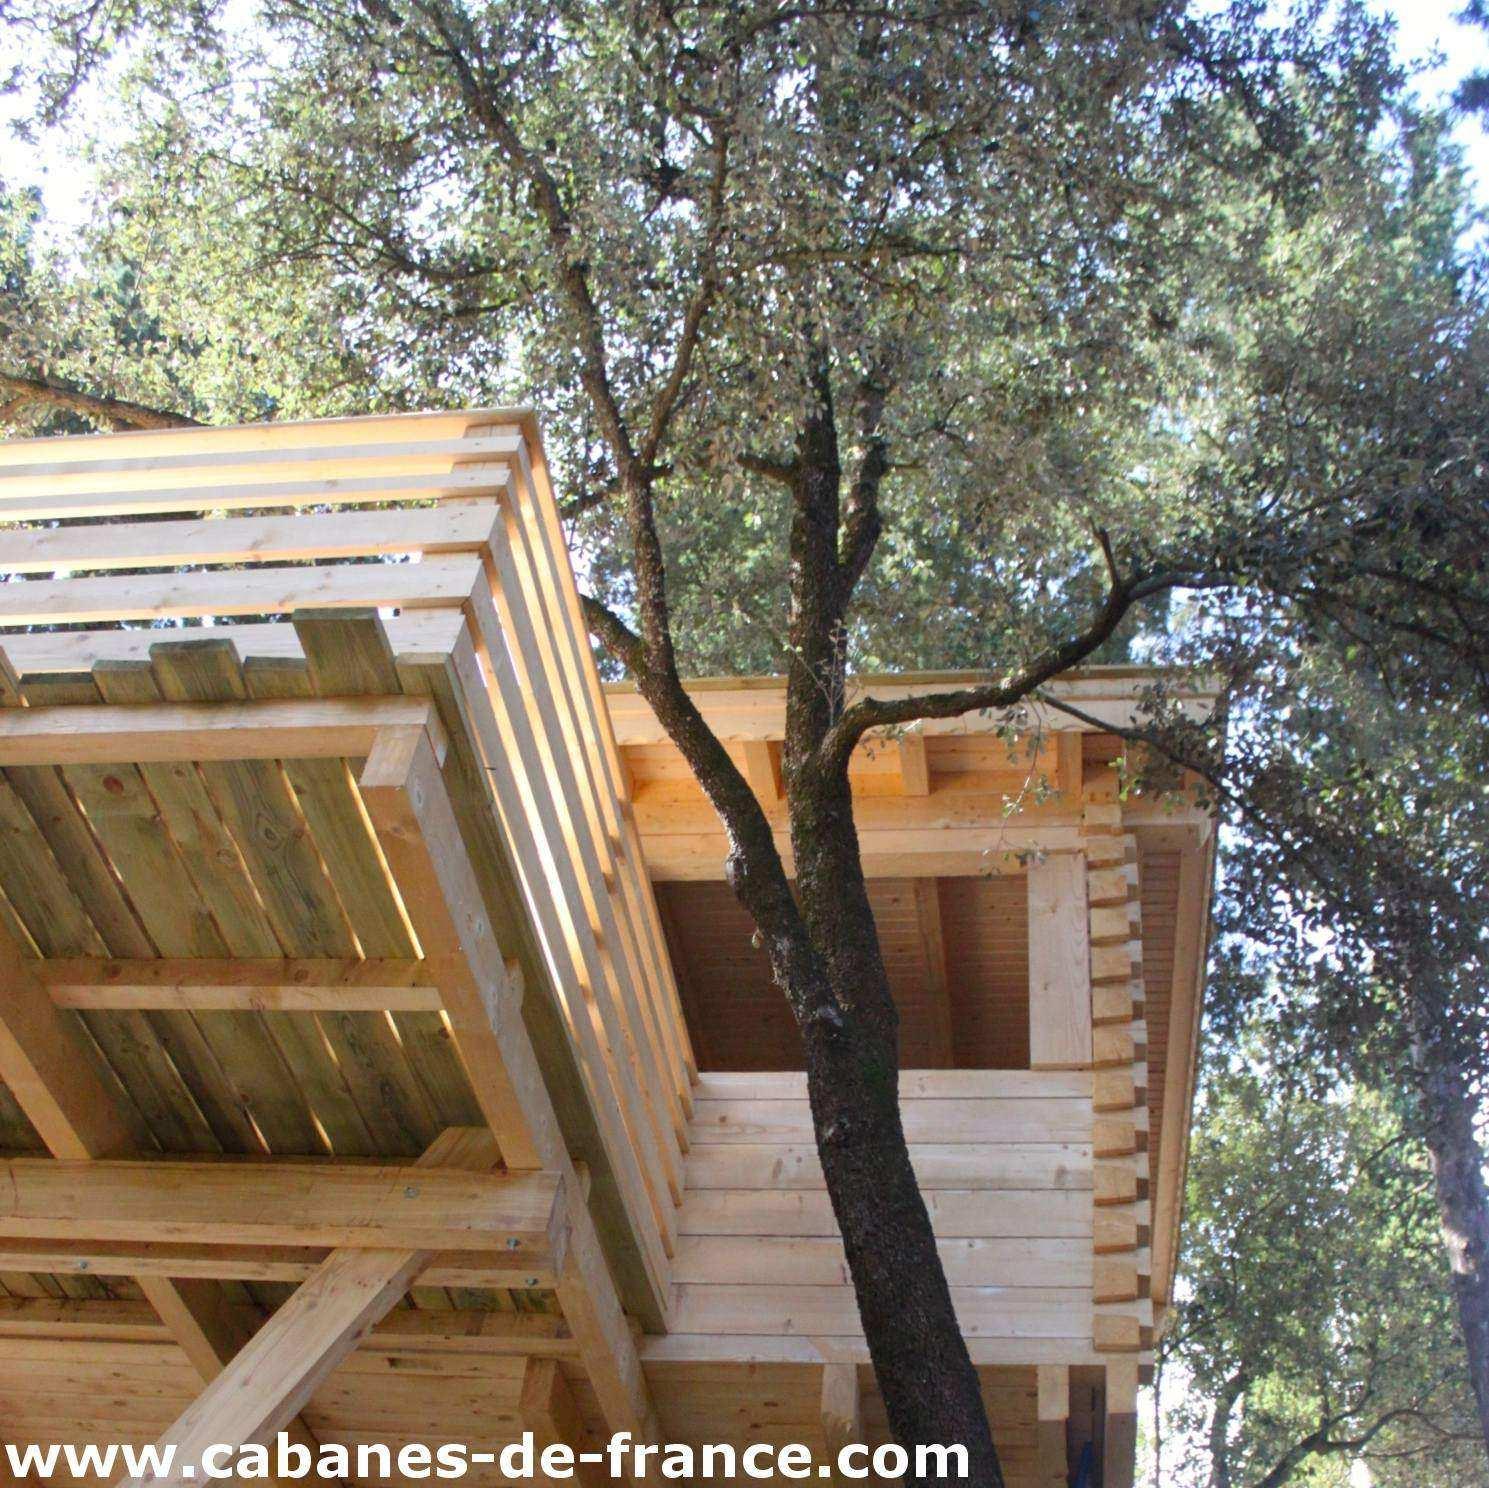 Cabane arbre villalier